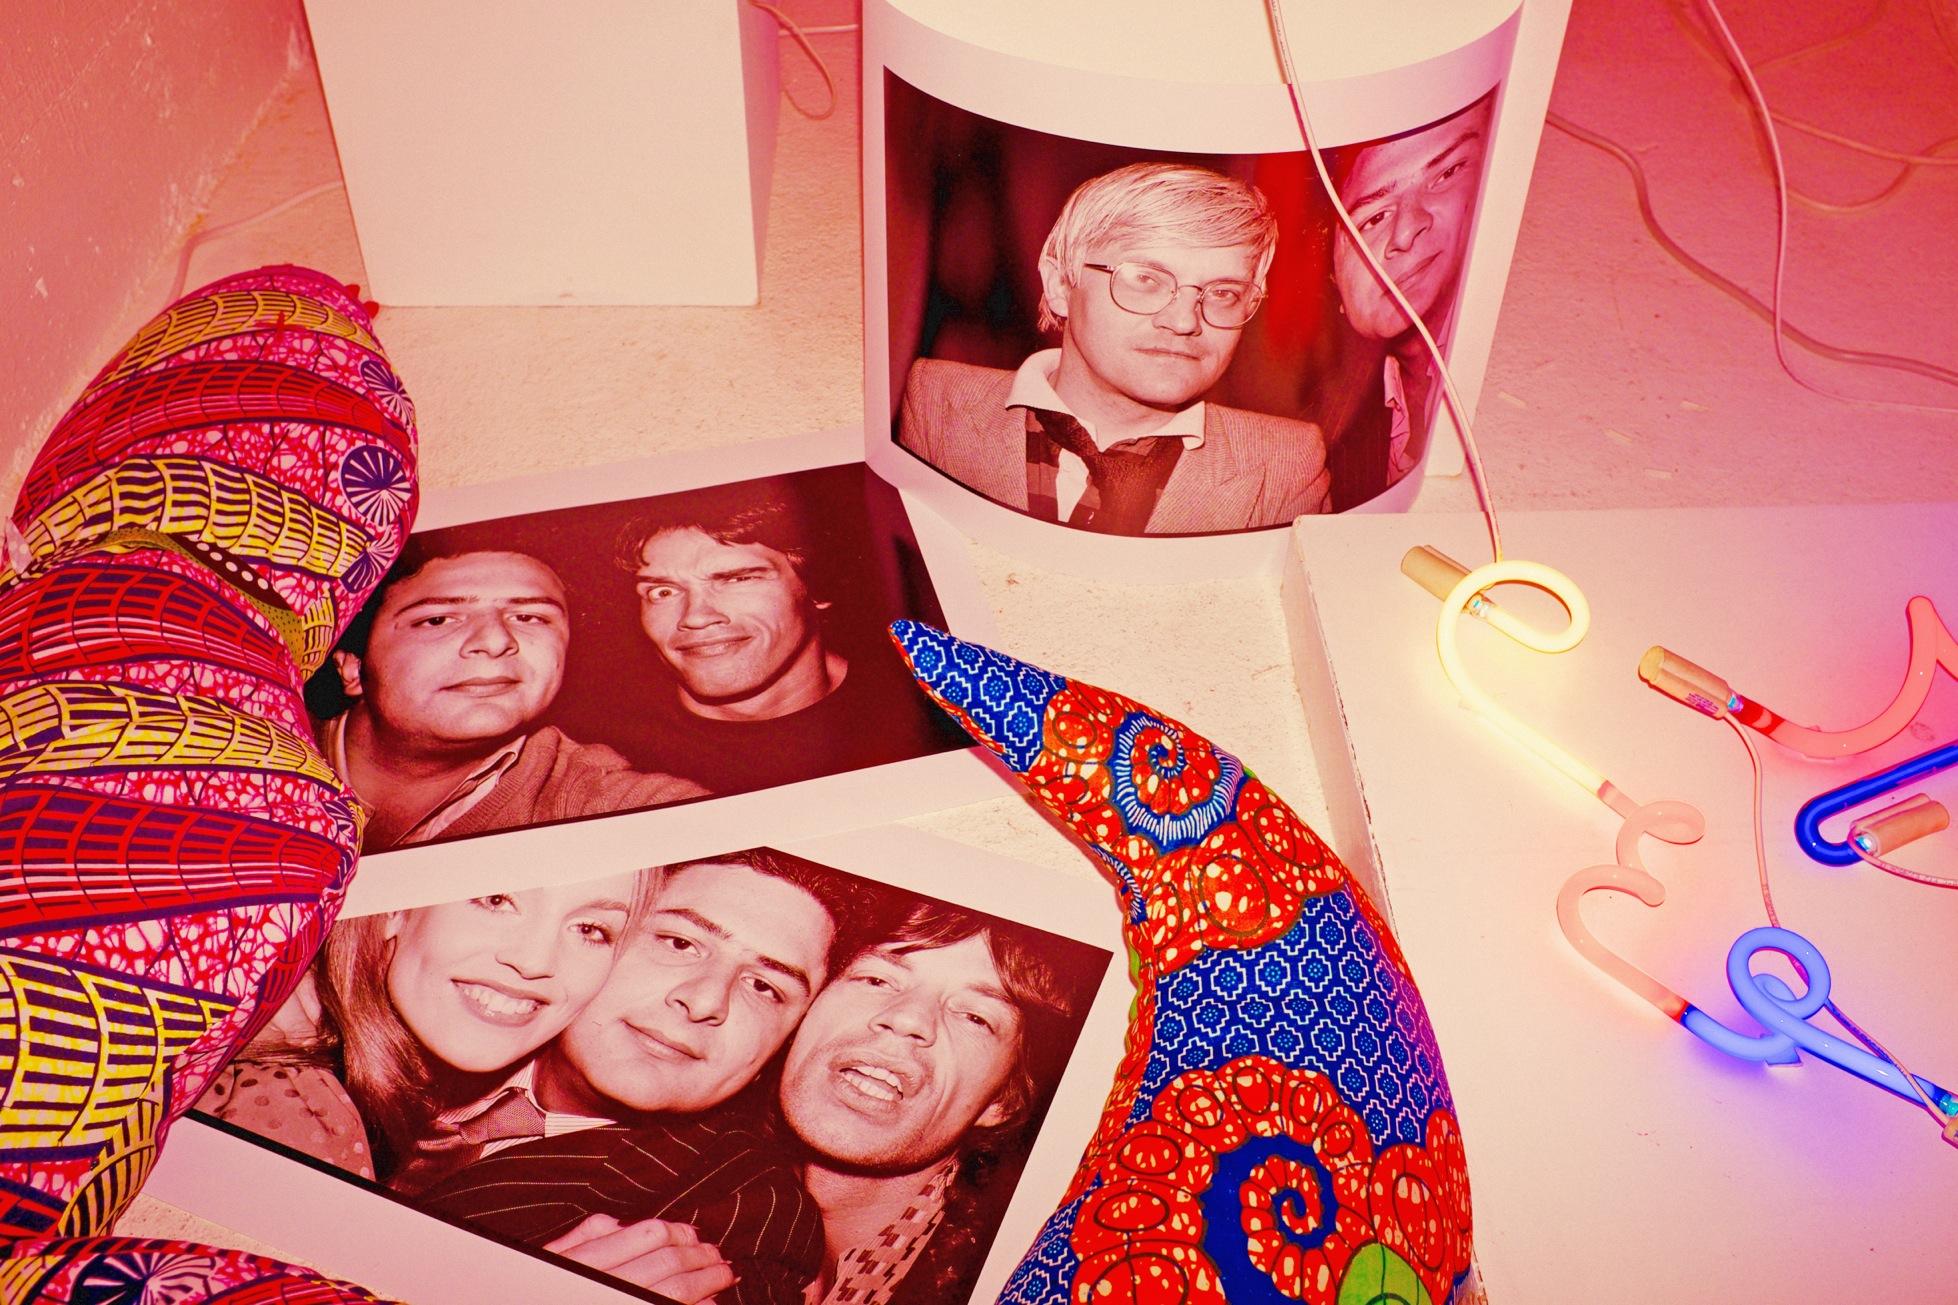 Jean Pigozzi's celebrity portraits